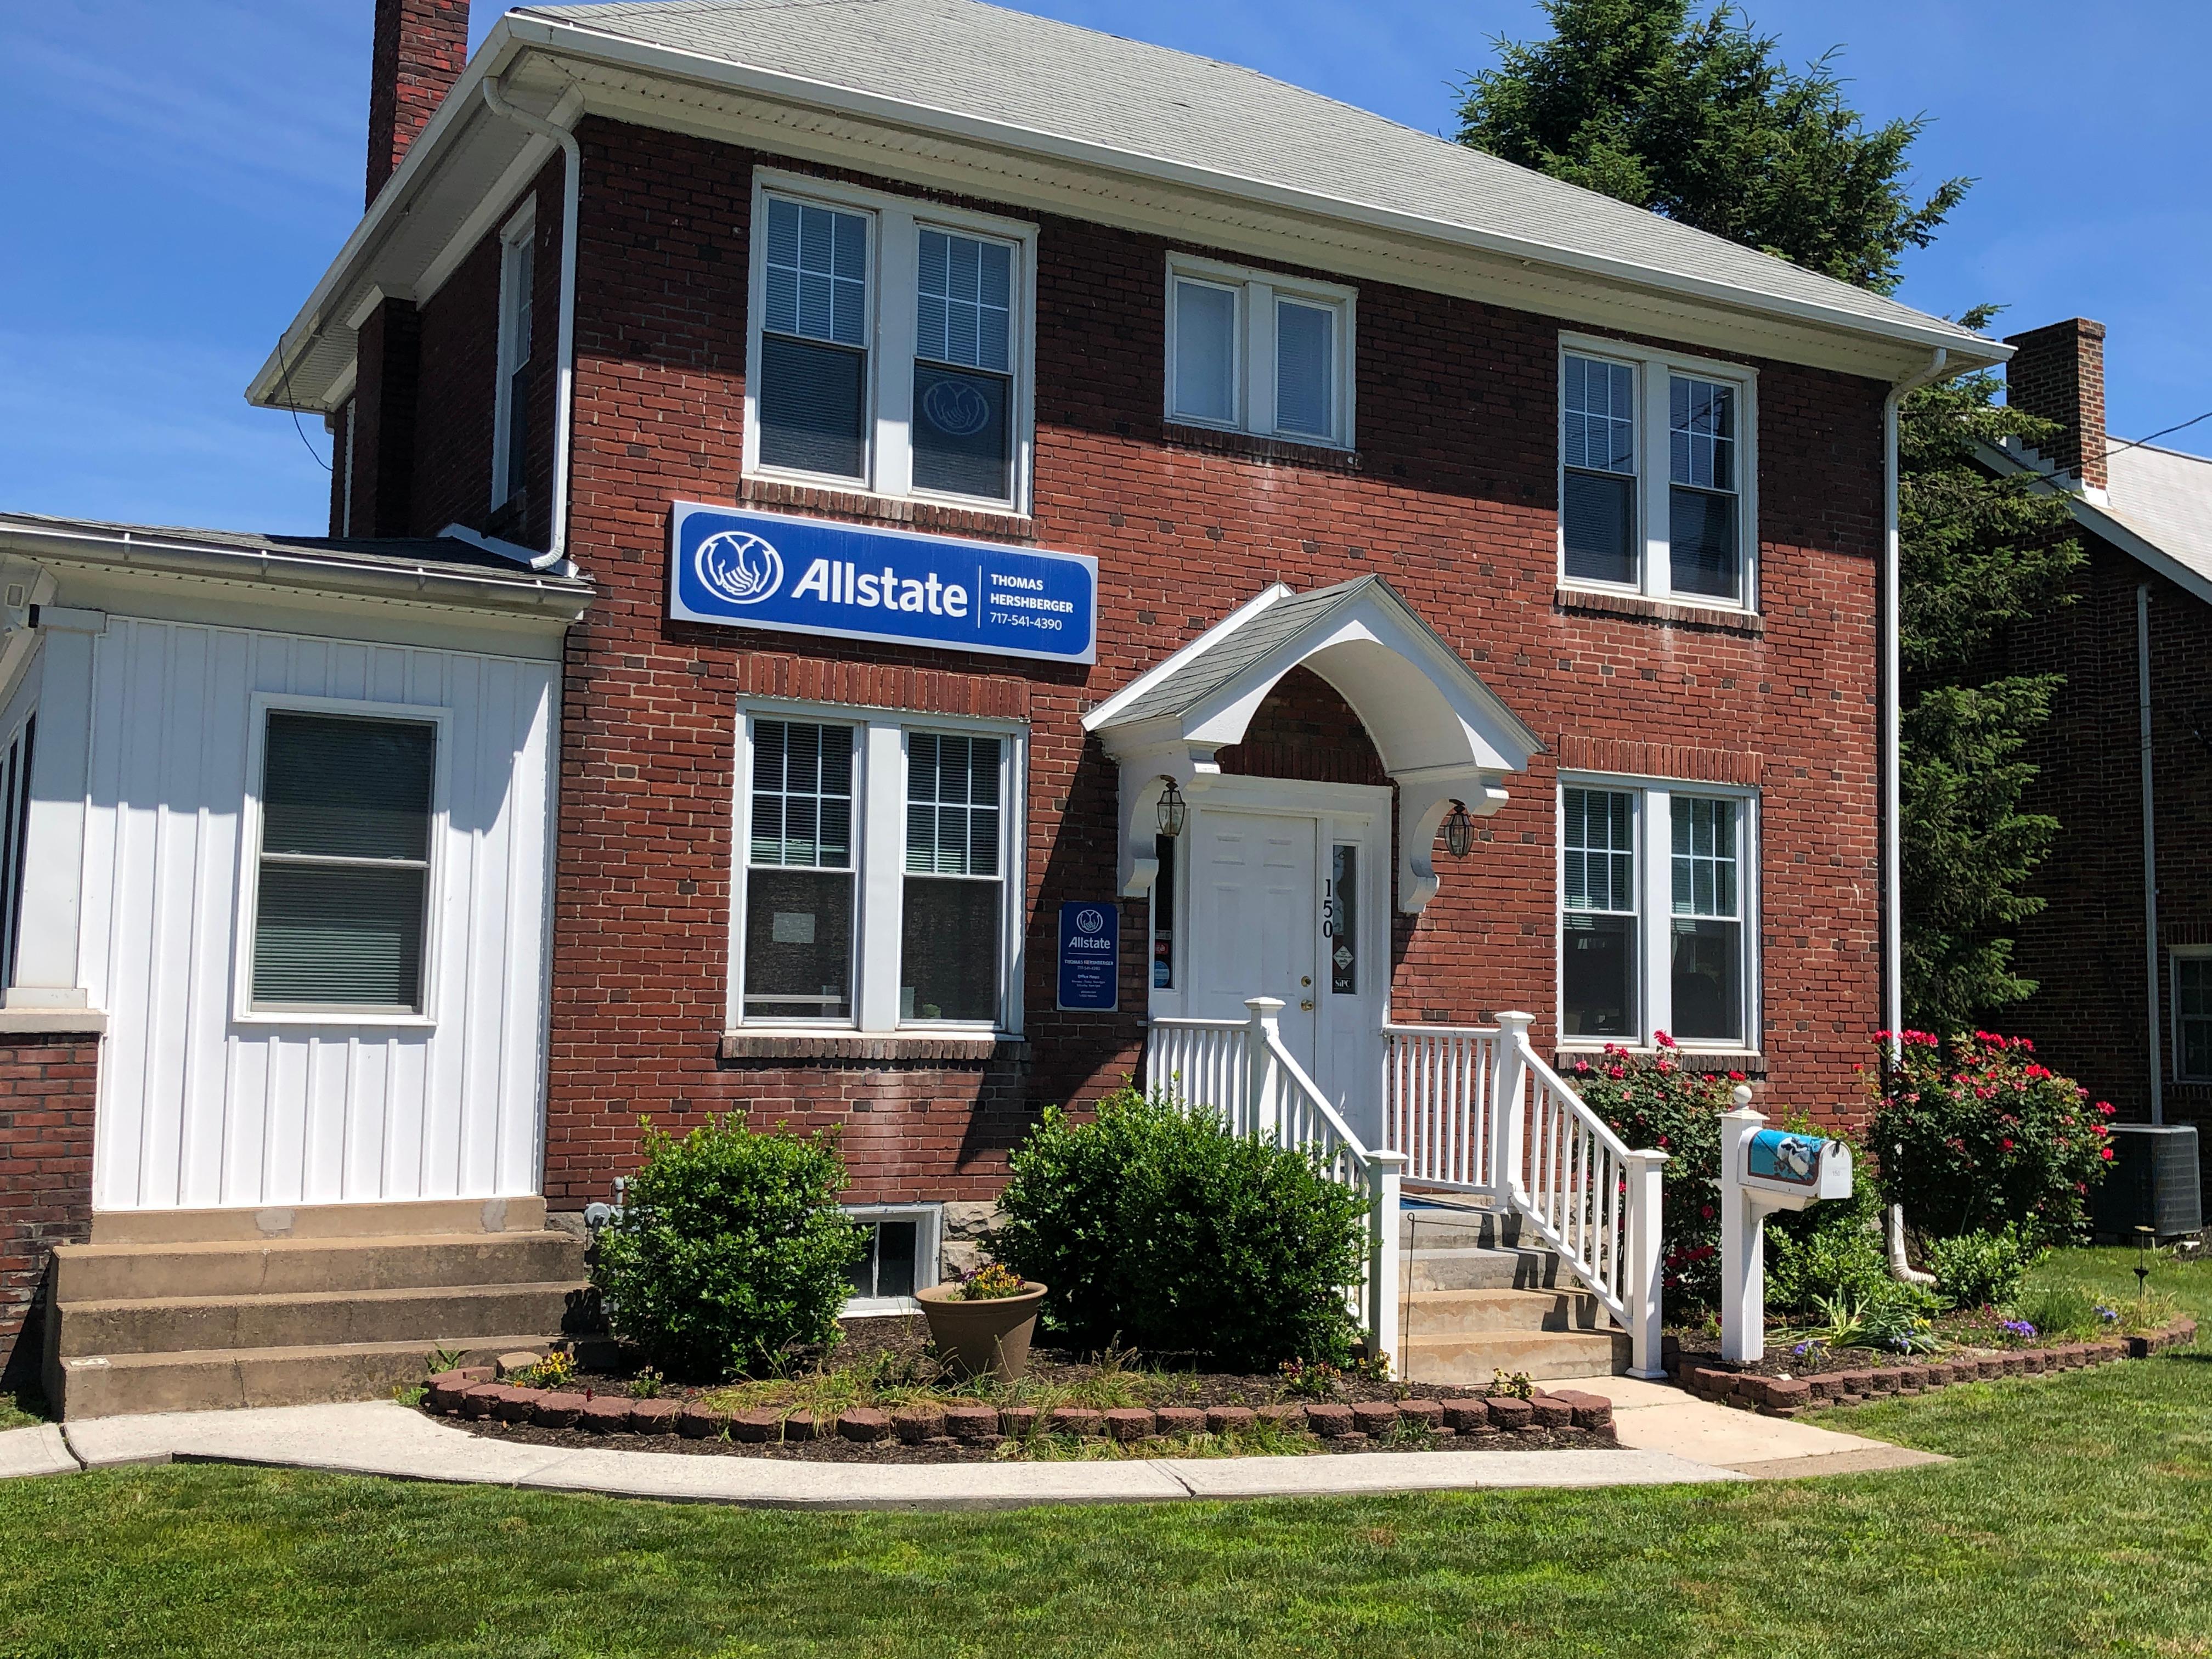 Thomas Hershberger: Allstate Insurance image 4